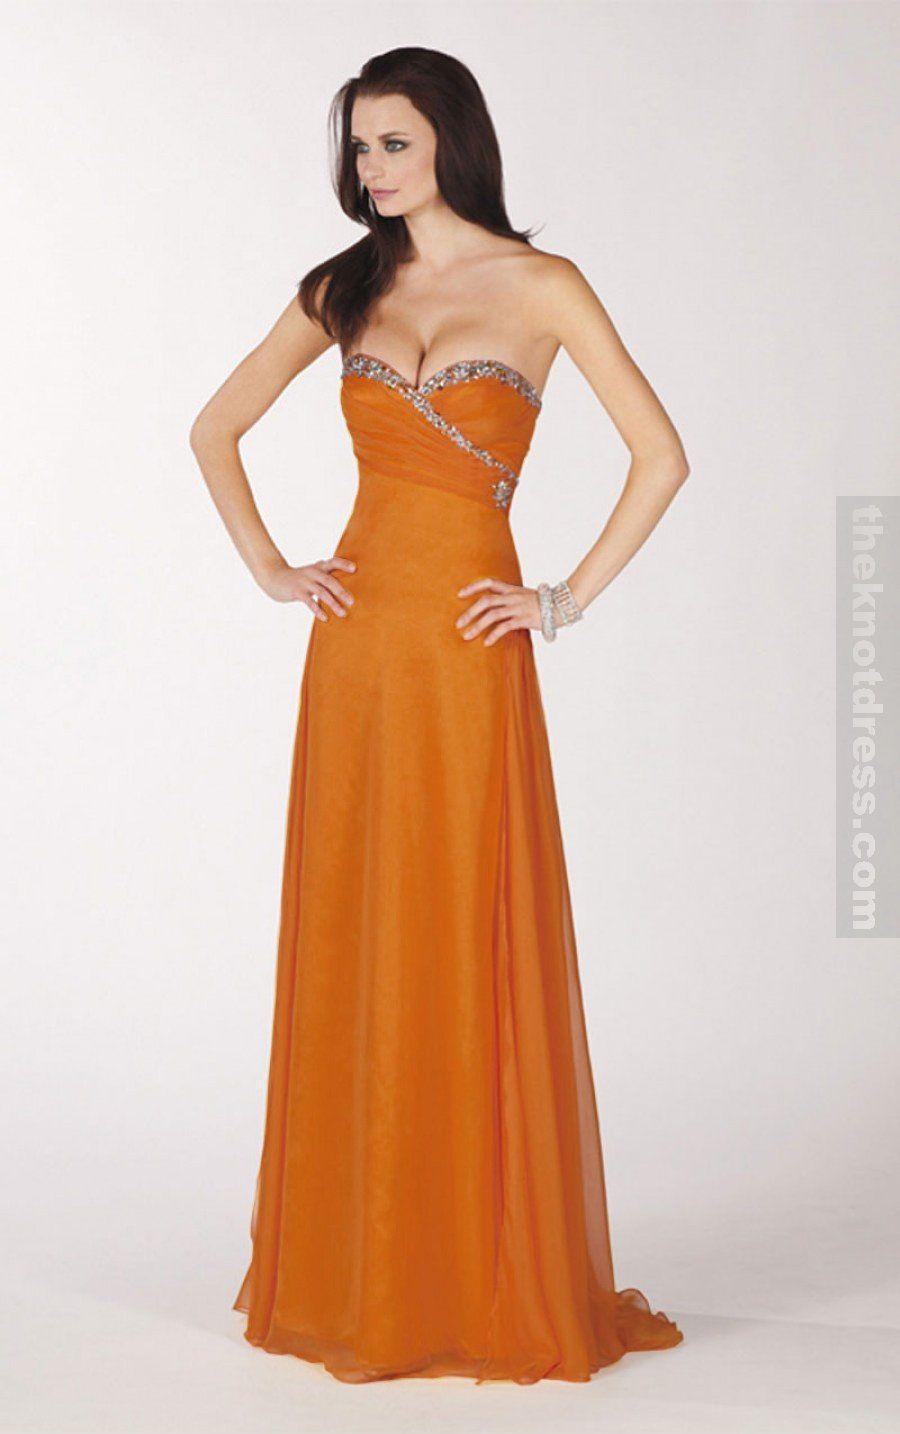 Military ball gown | Orange prom dresses, Bridesmaid ...